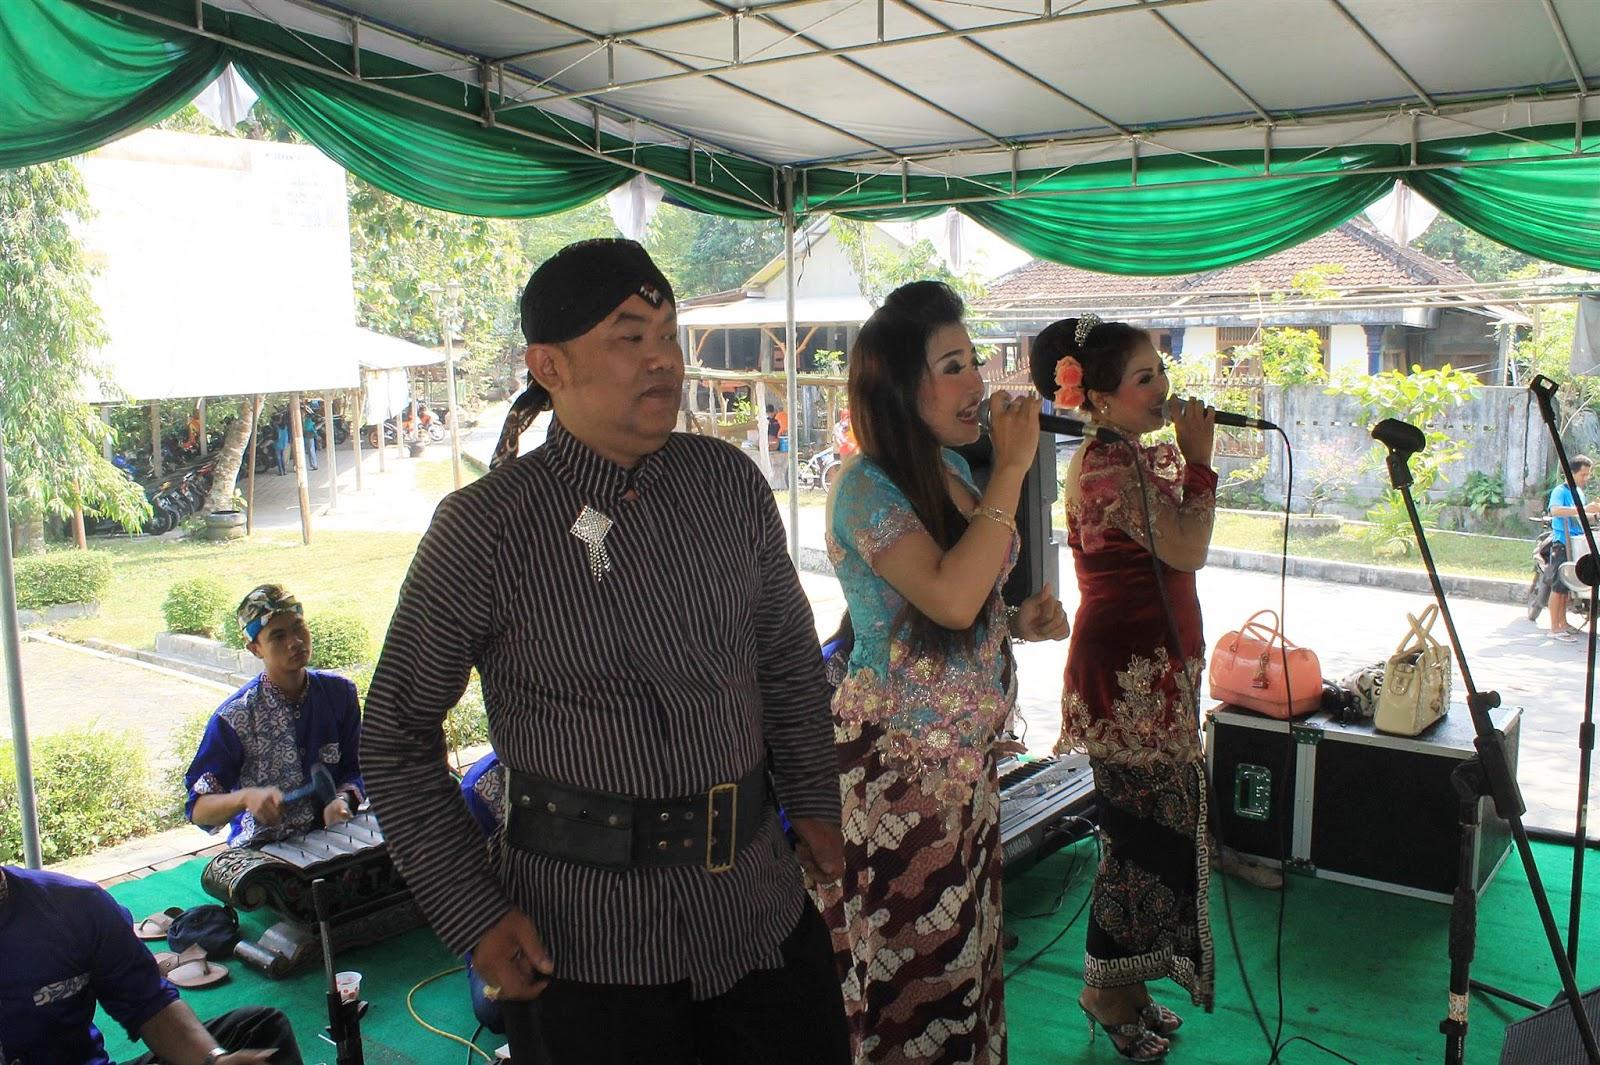 Sekretaris Dinas Pariwisata Kabupaten Bantul Tandang Goa Selarong Kab